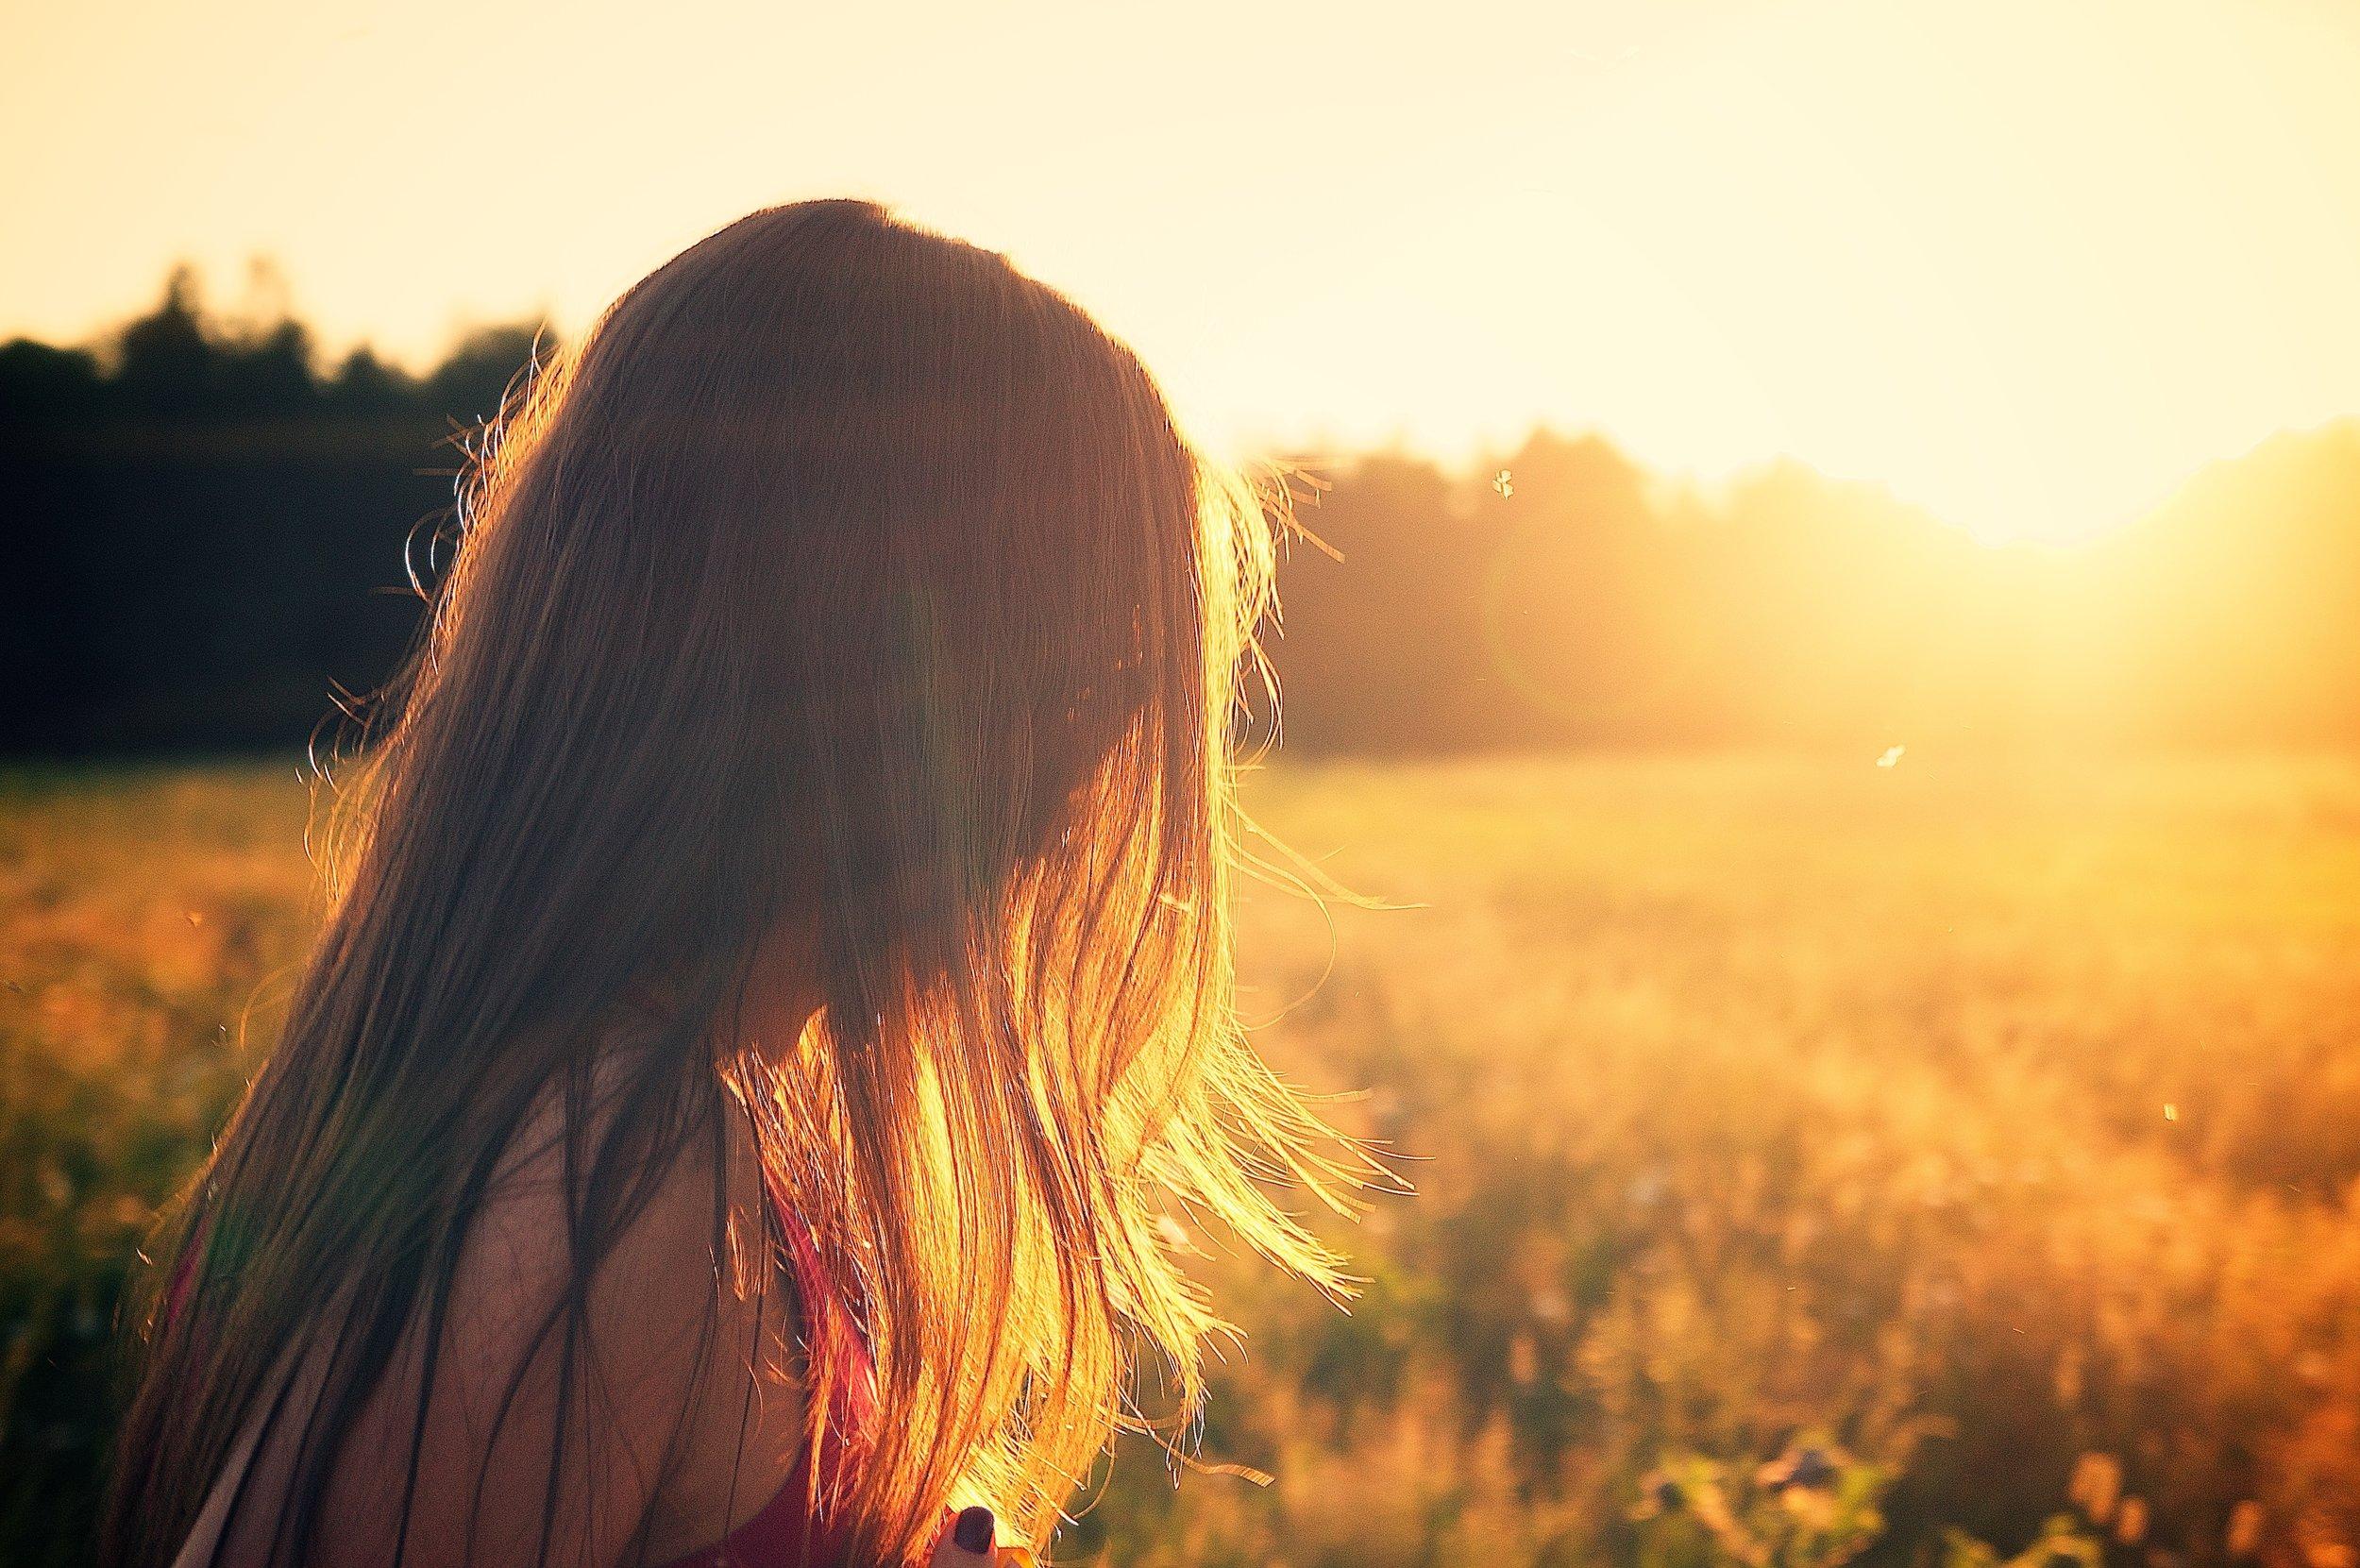 uwm.flower.essence.woman.nature-people-girl-sunshine-sun-woman-970946-pxhere.com